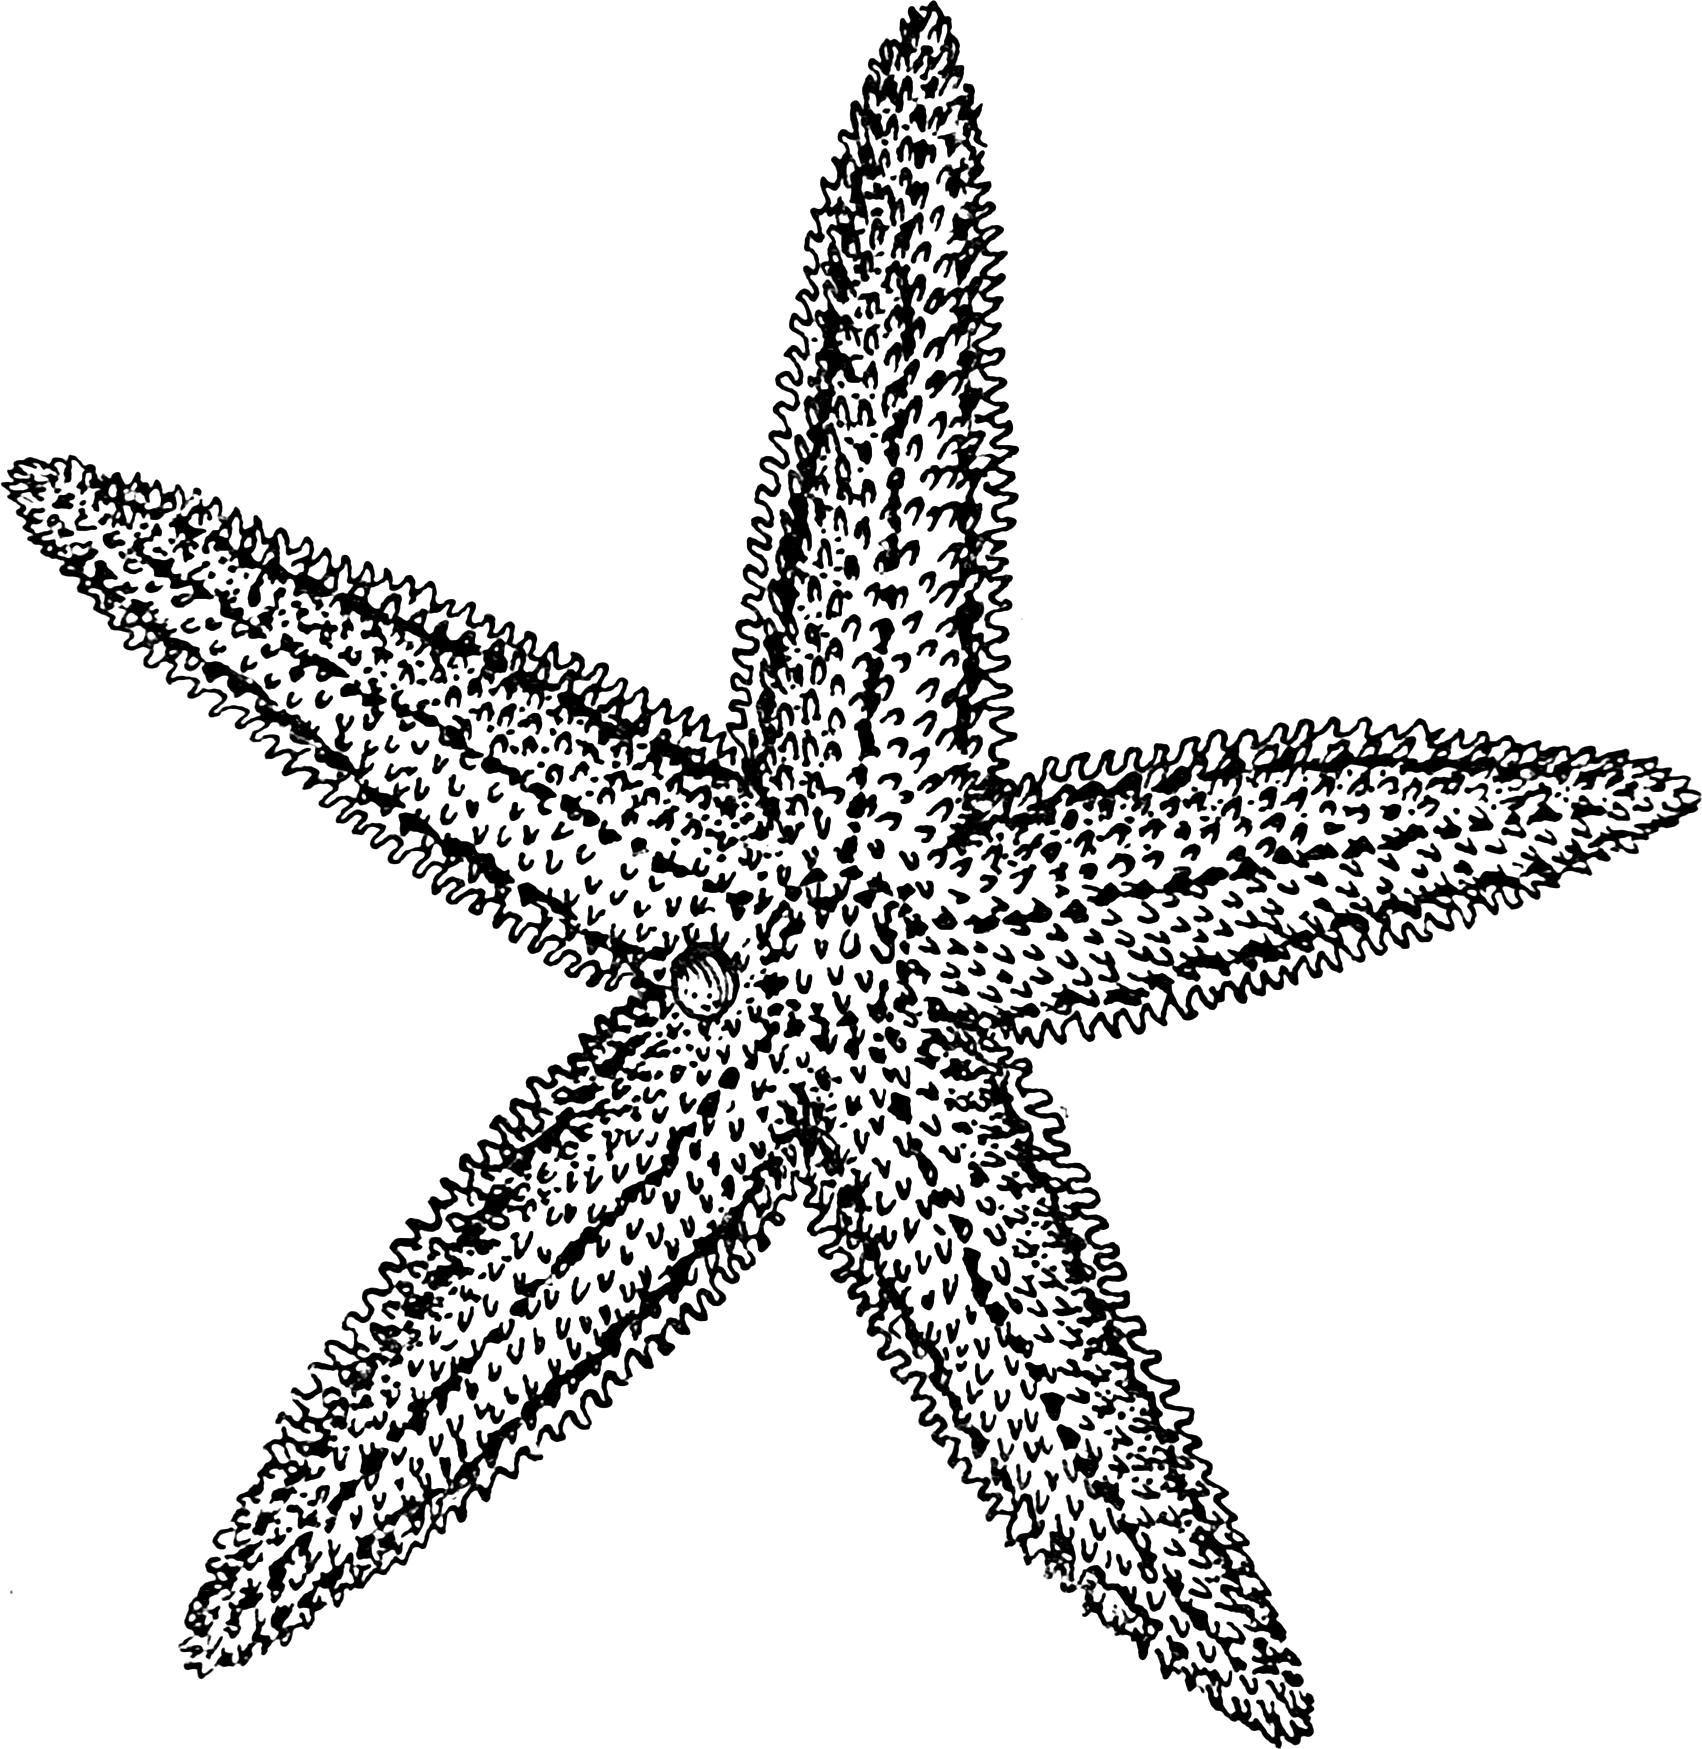 Starfish Or Sea Stars Are Star Shaped Echinoderms